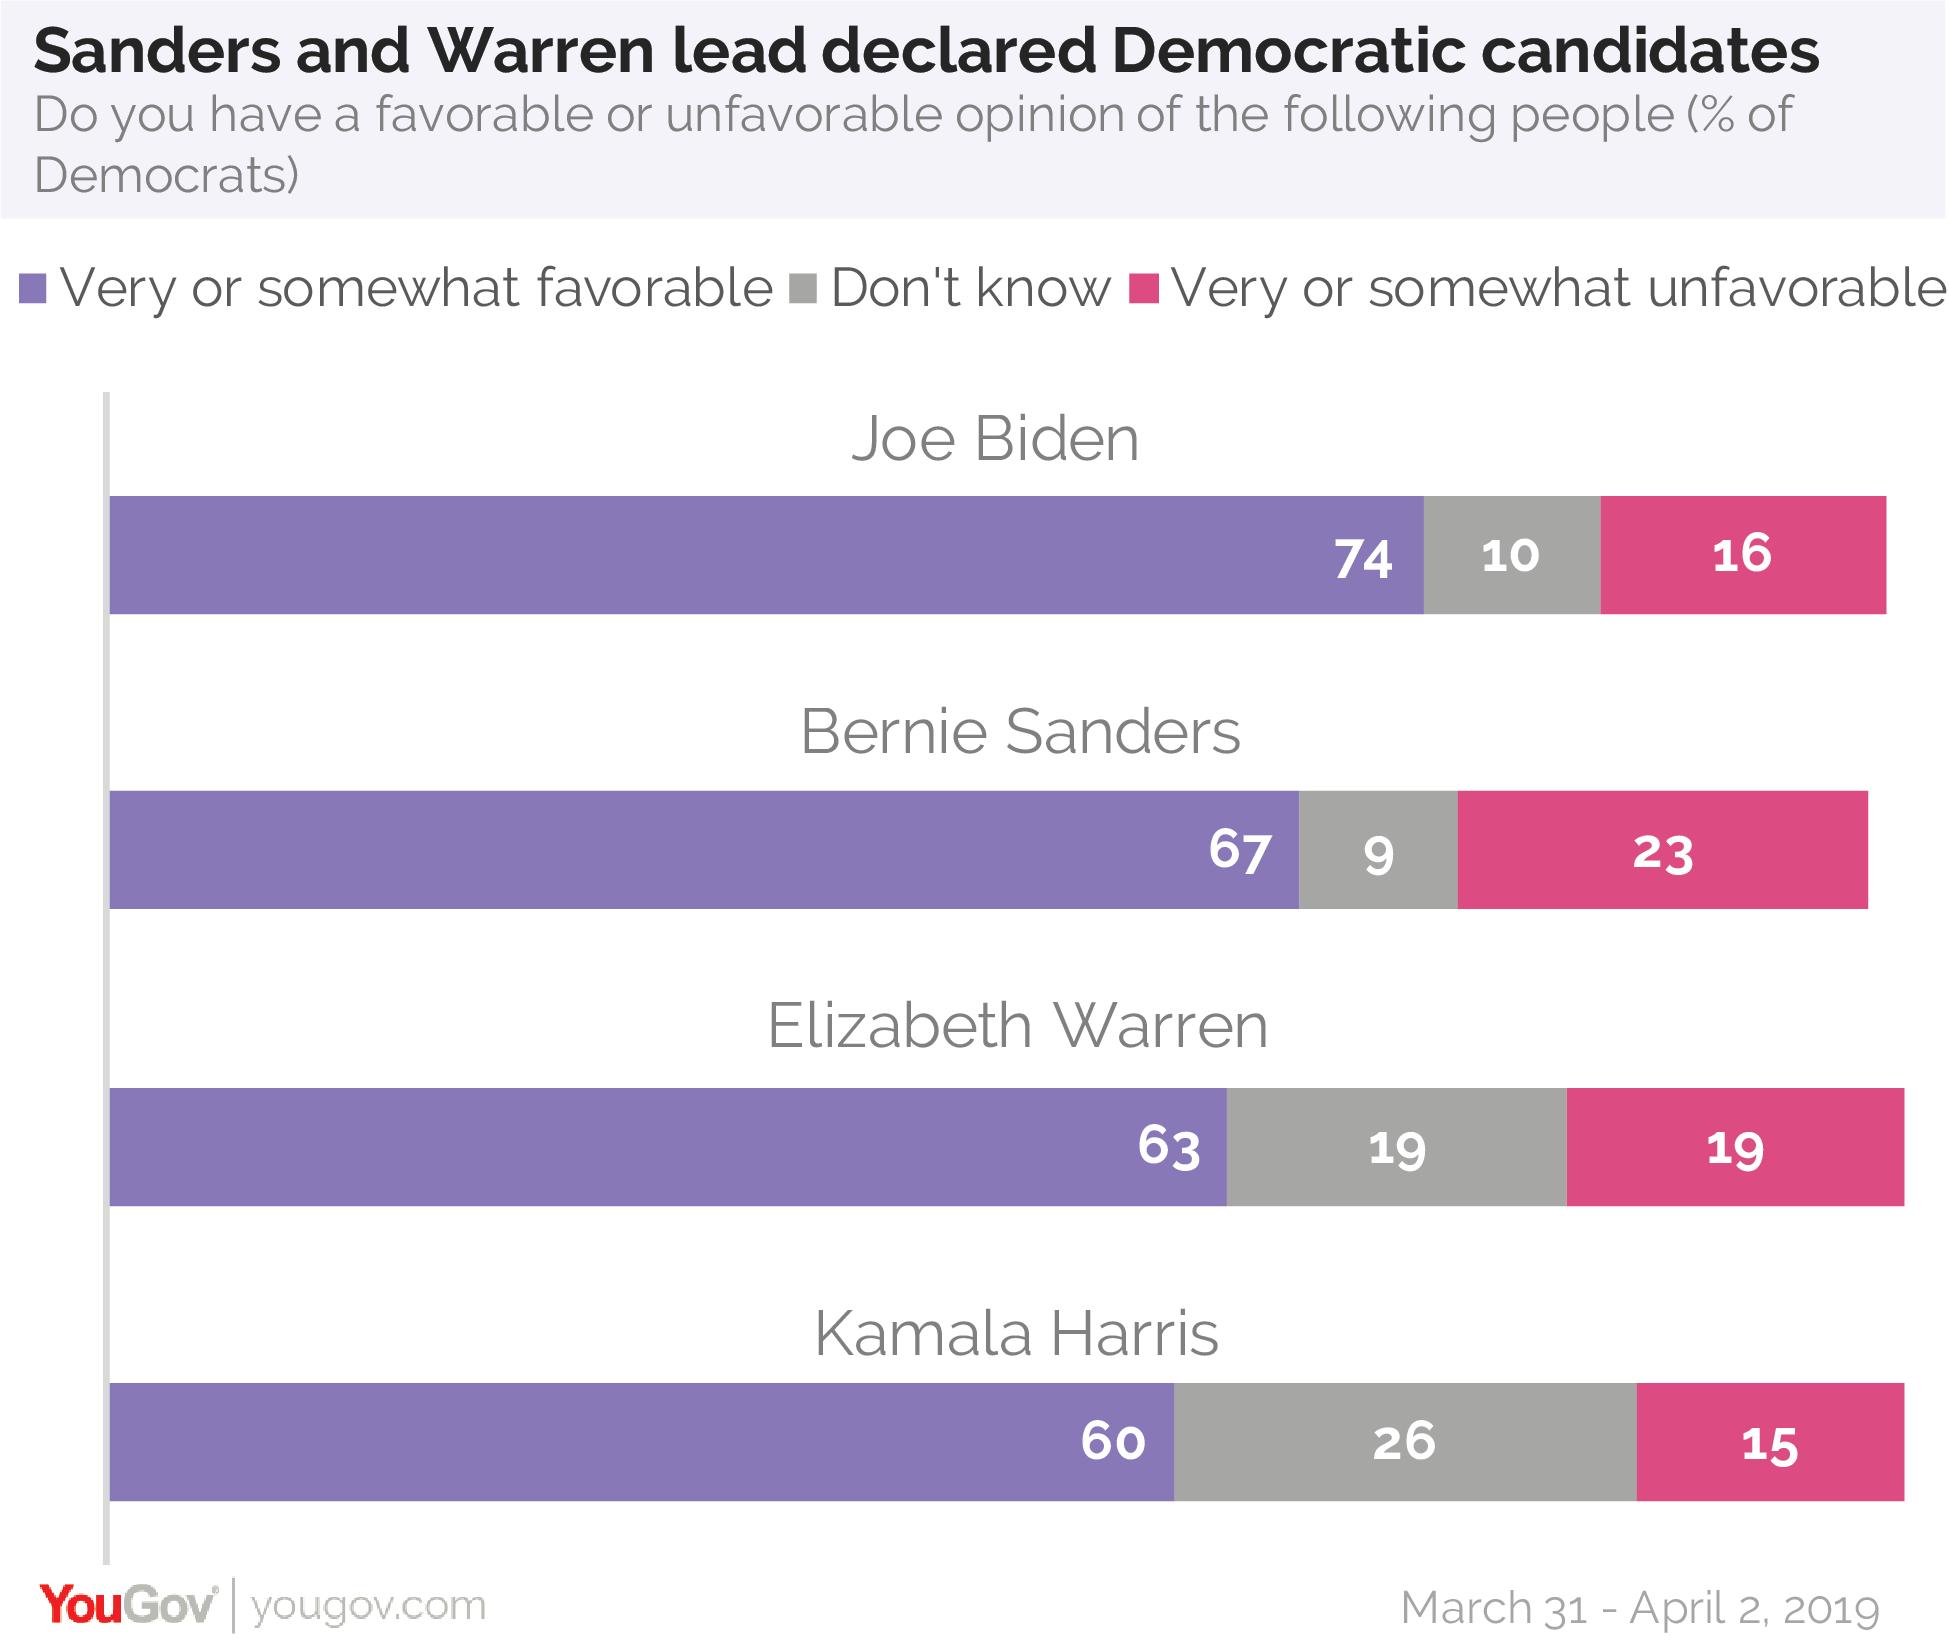 Bernie Sanders and Elizabeth Warren lead declared Democratic candidates